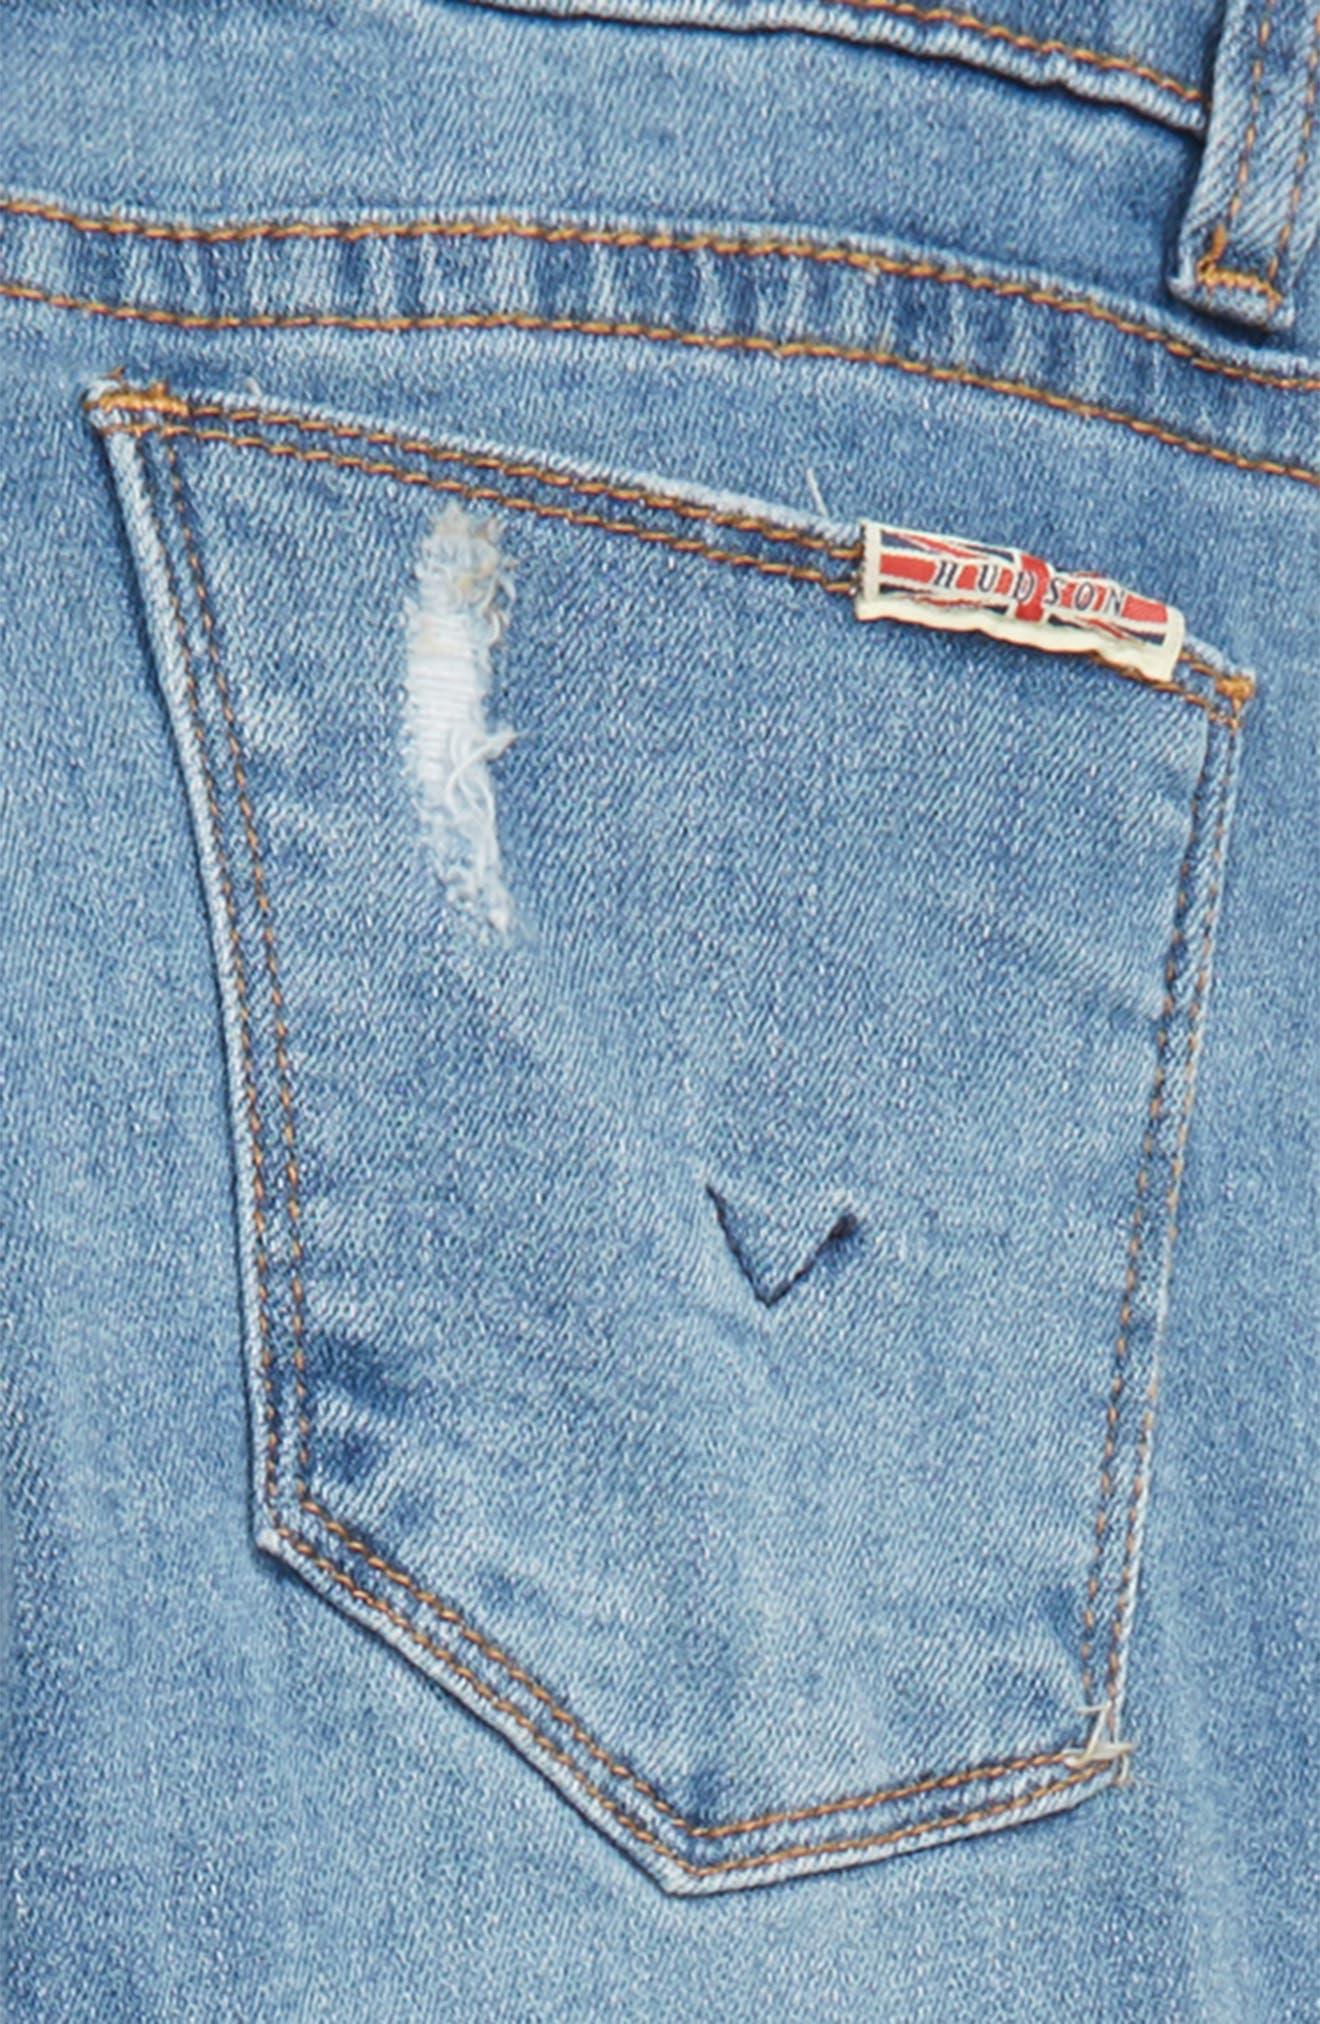 Kaia Convertible Skinny Jeans,                             Alternate thumbnail 3, color,                             COASTAL BLUE WASH